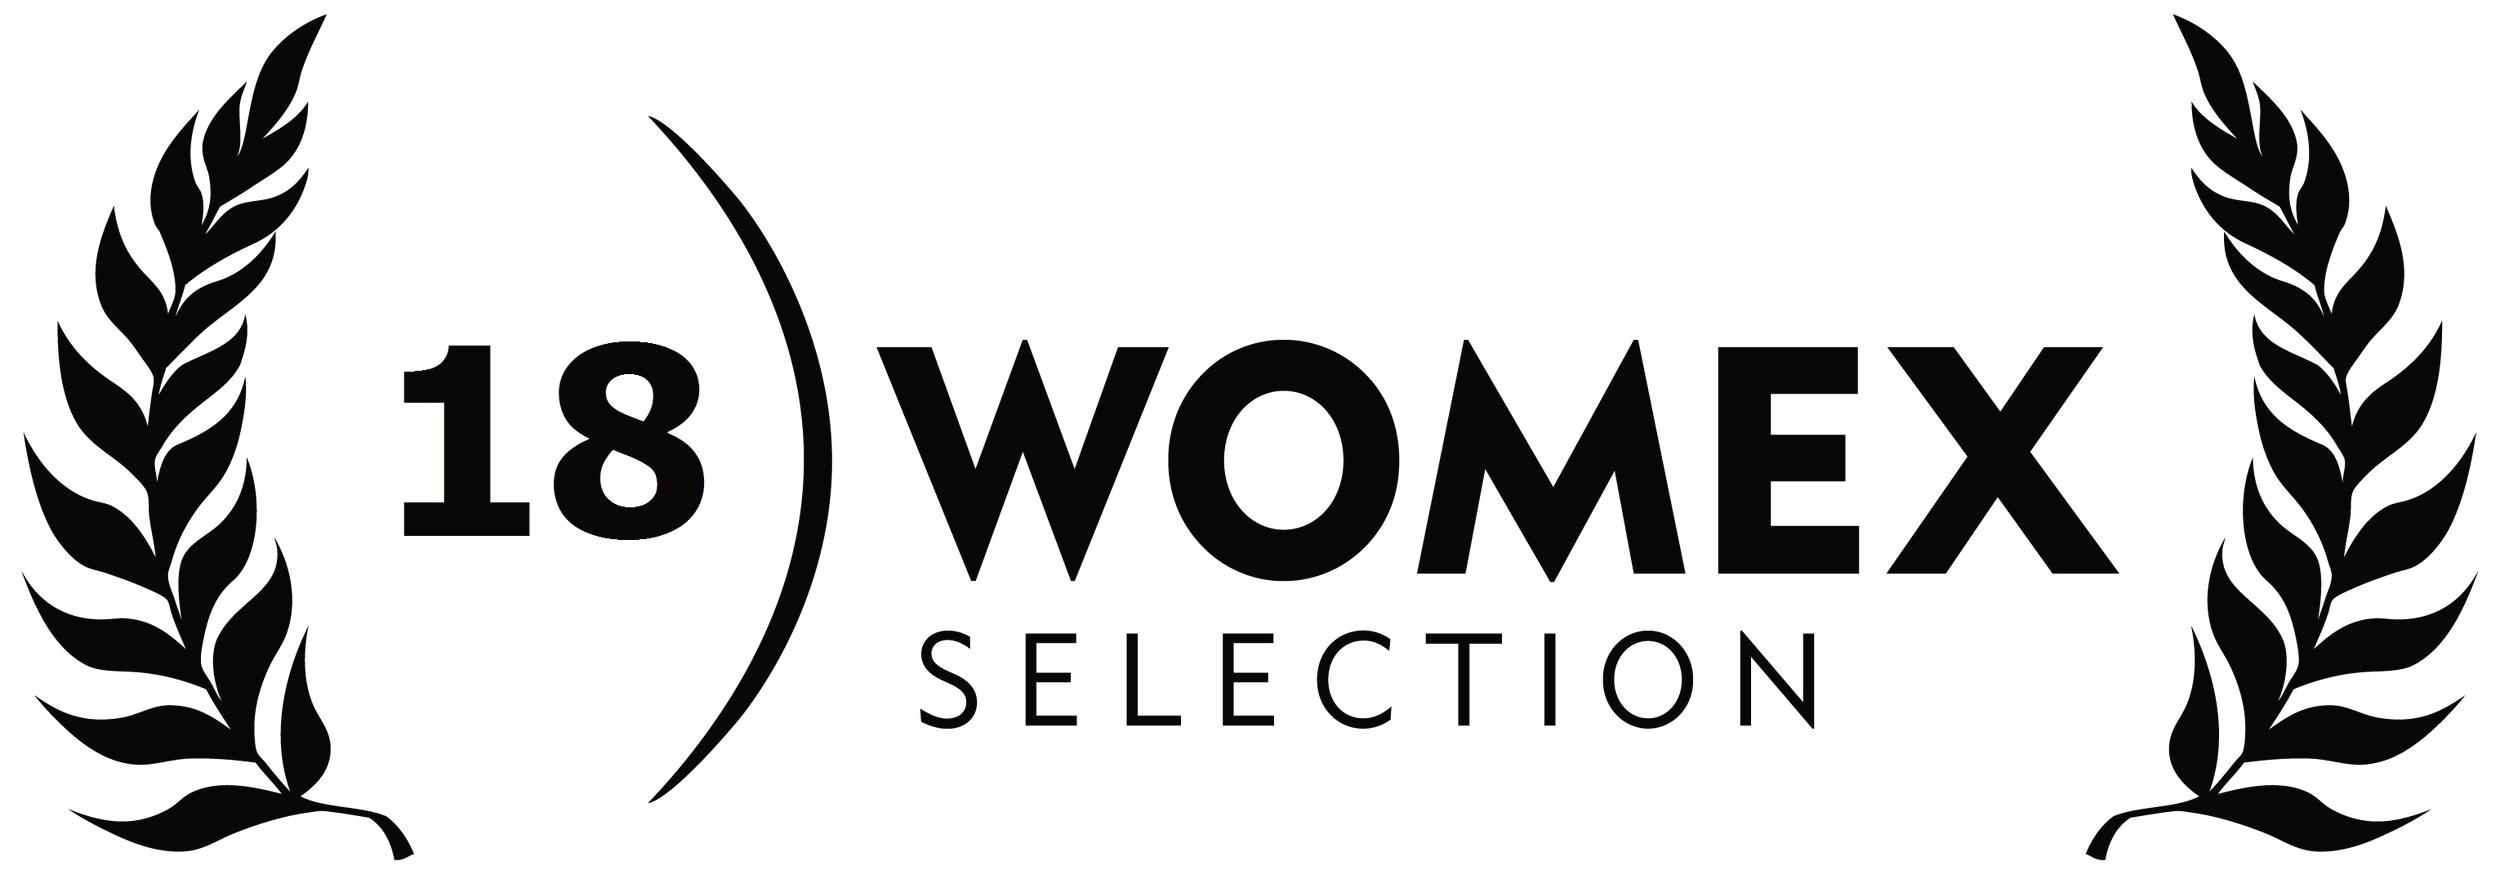 WOMEX_selection_2017_black.jpg